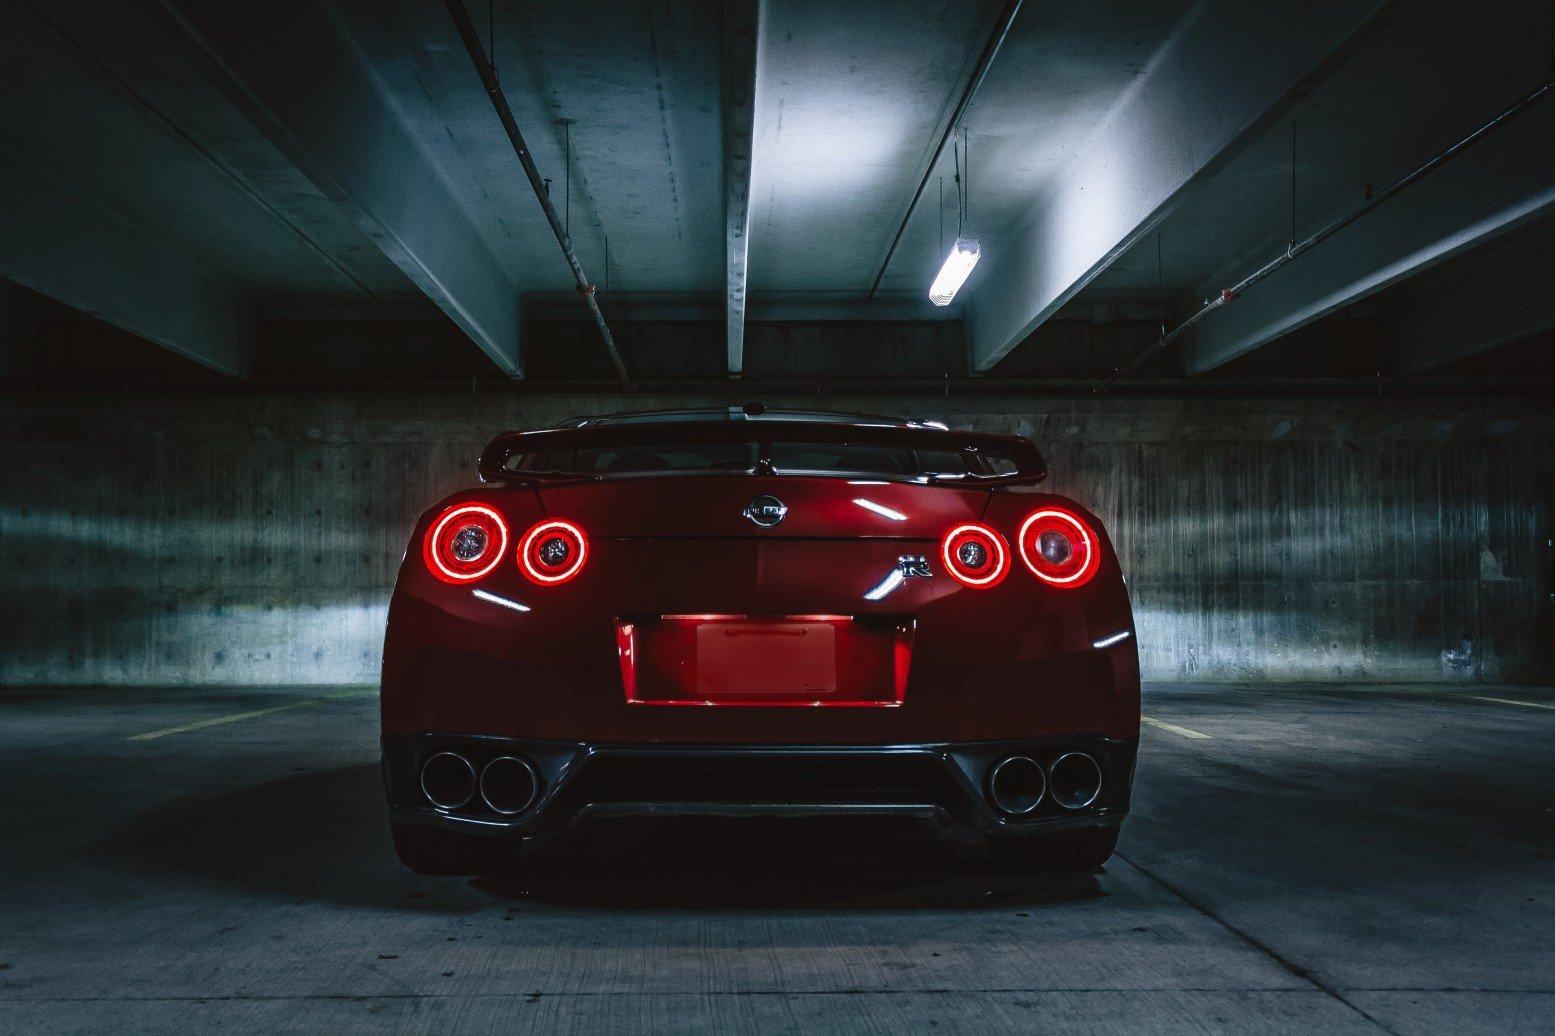 Nissan Versa- Aoonuauto Car Lighting to Upgrade Your Car LEDs